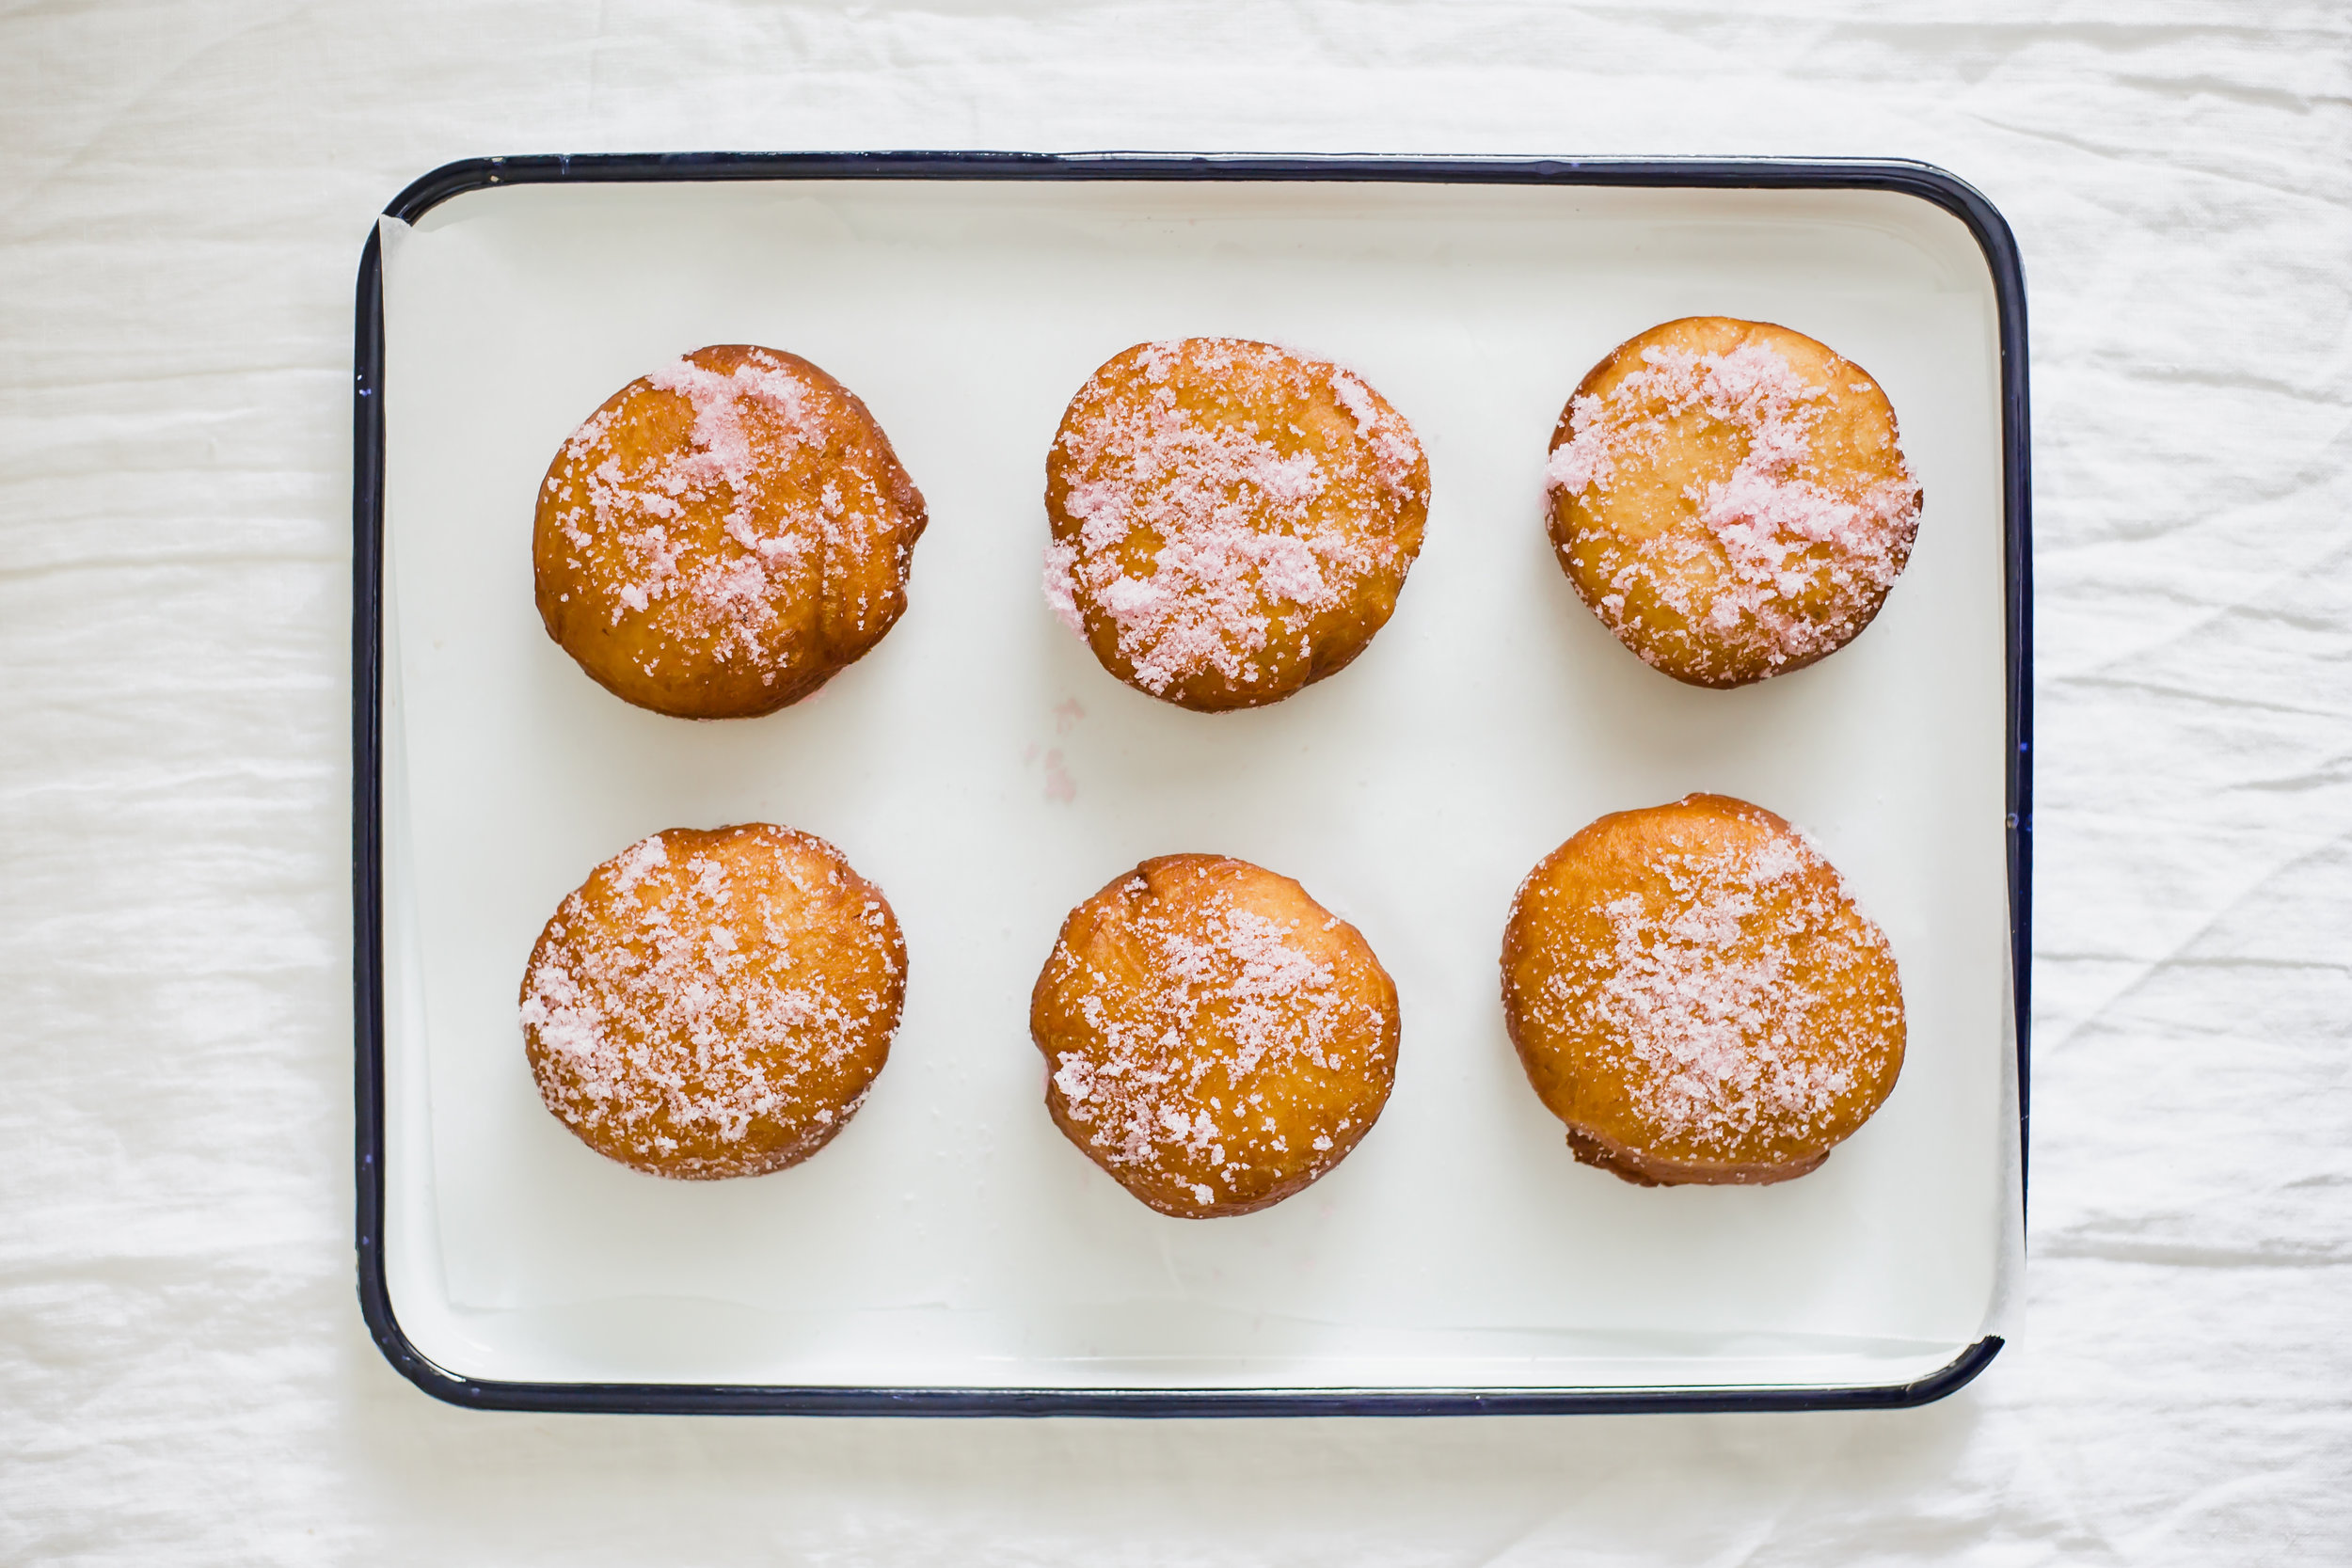 pomegranate_cream_doughnuts-3.jpg